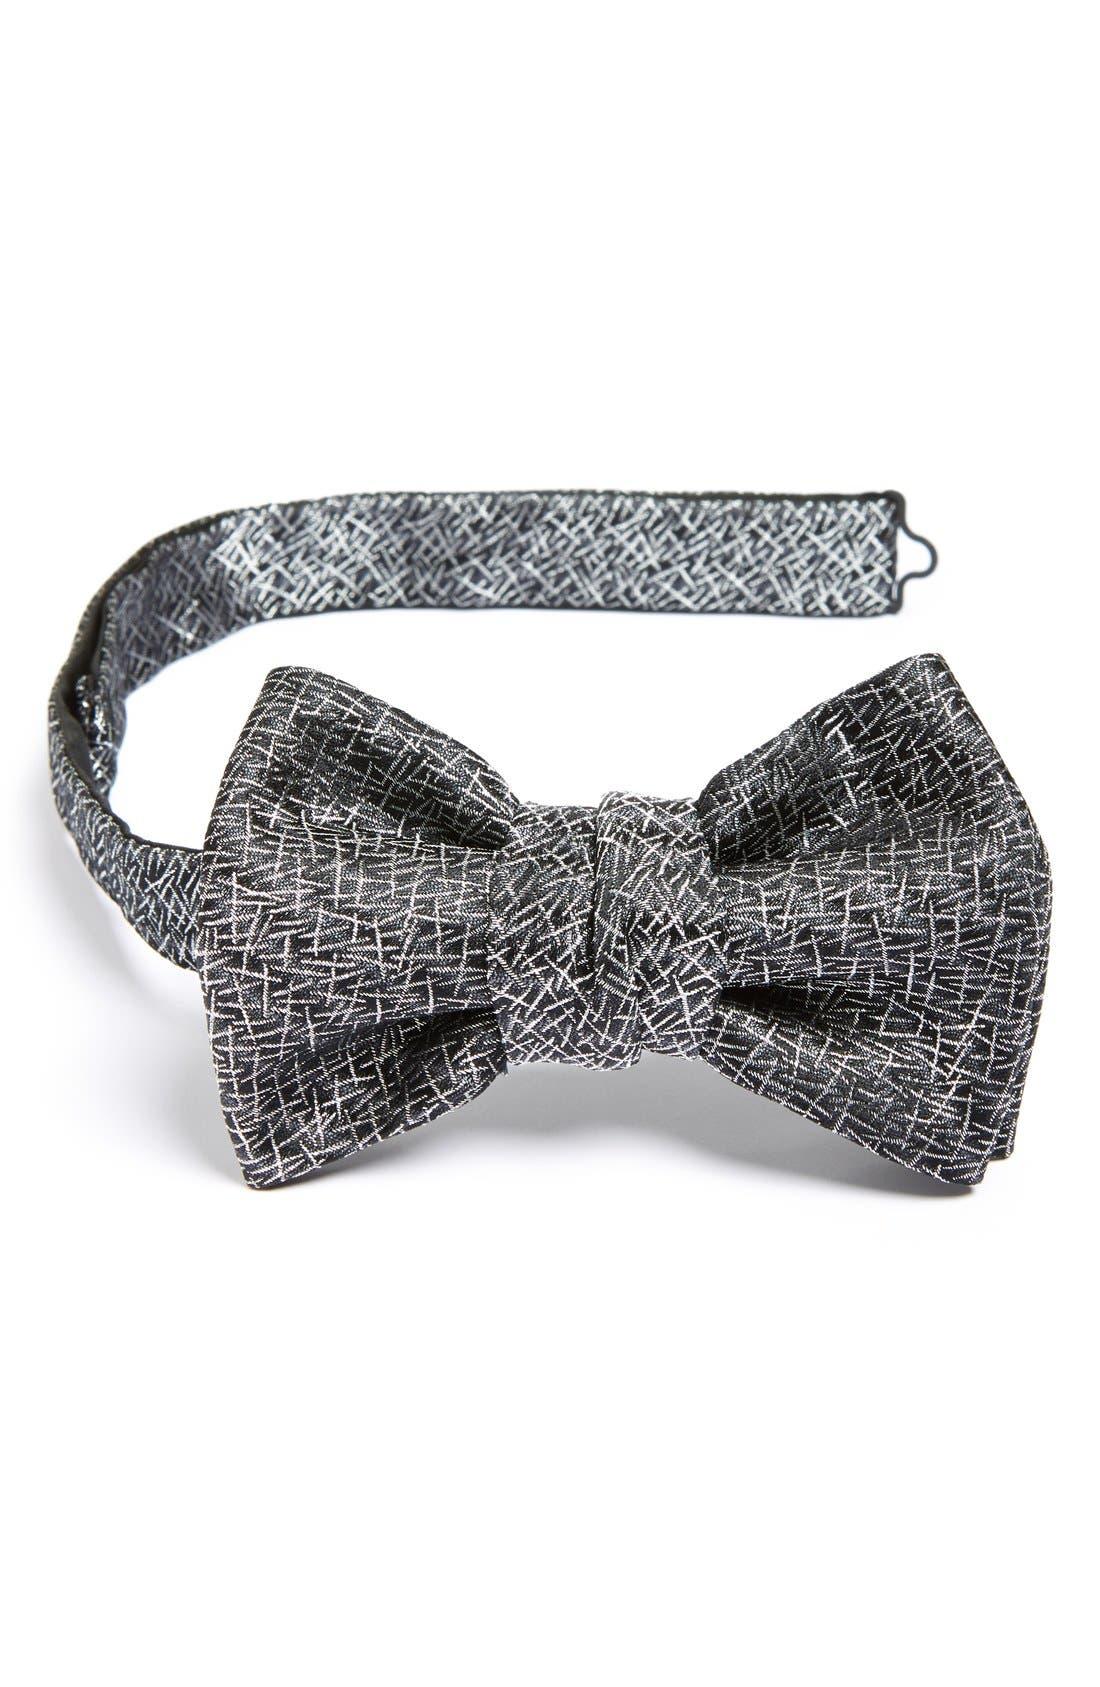 Alternate Image 1 Selected - Yves Saint Laurent 'Paris' Woven Silk Blend Bow Tie